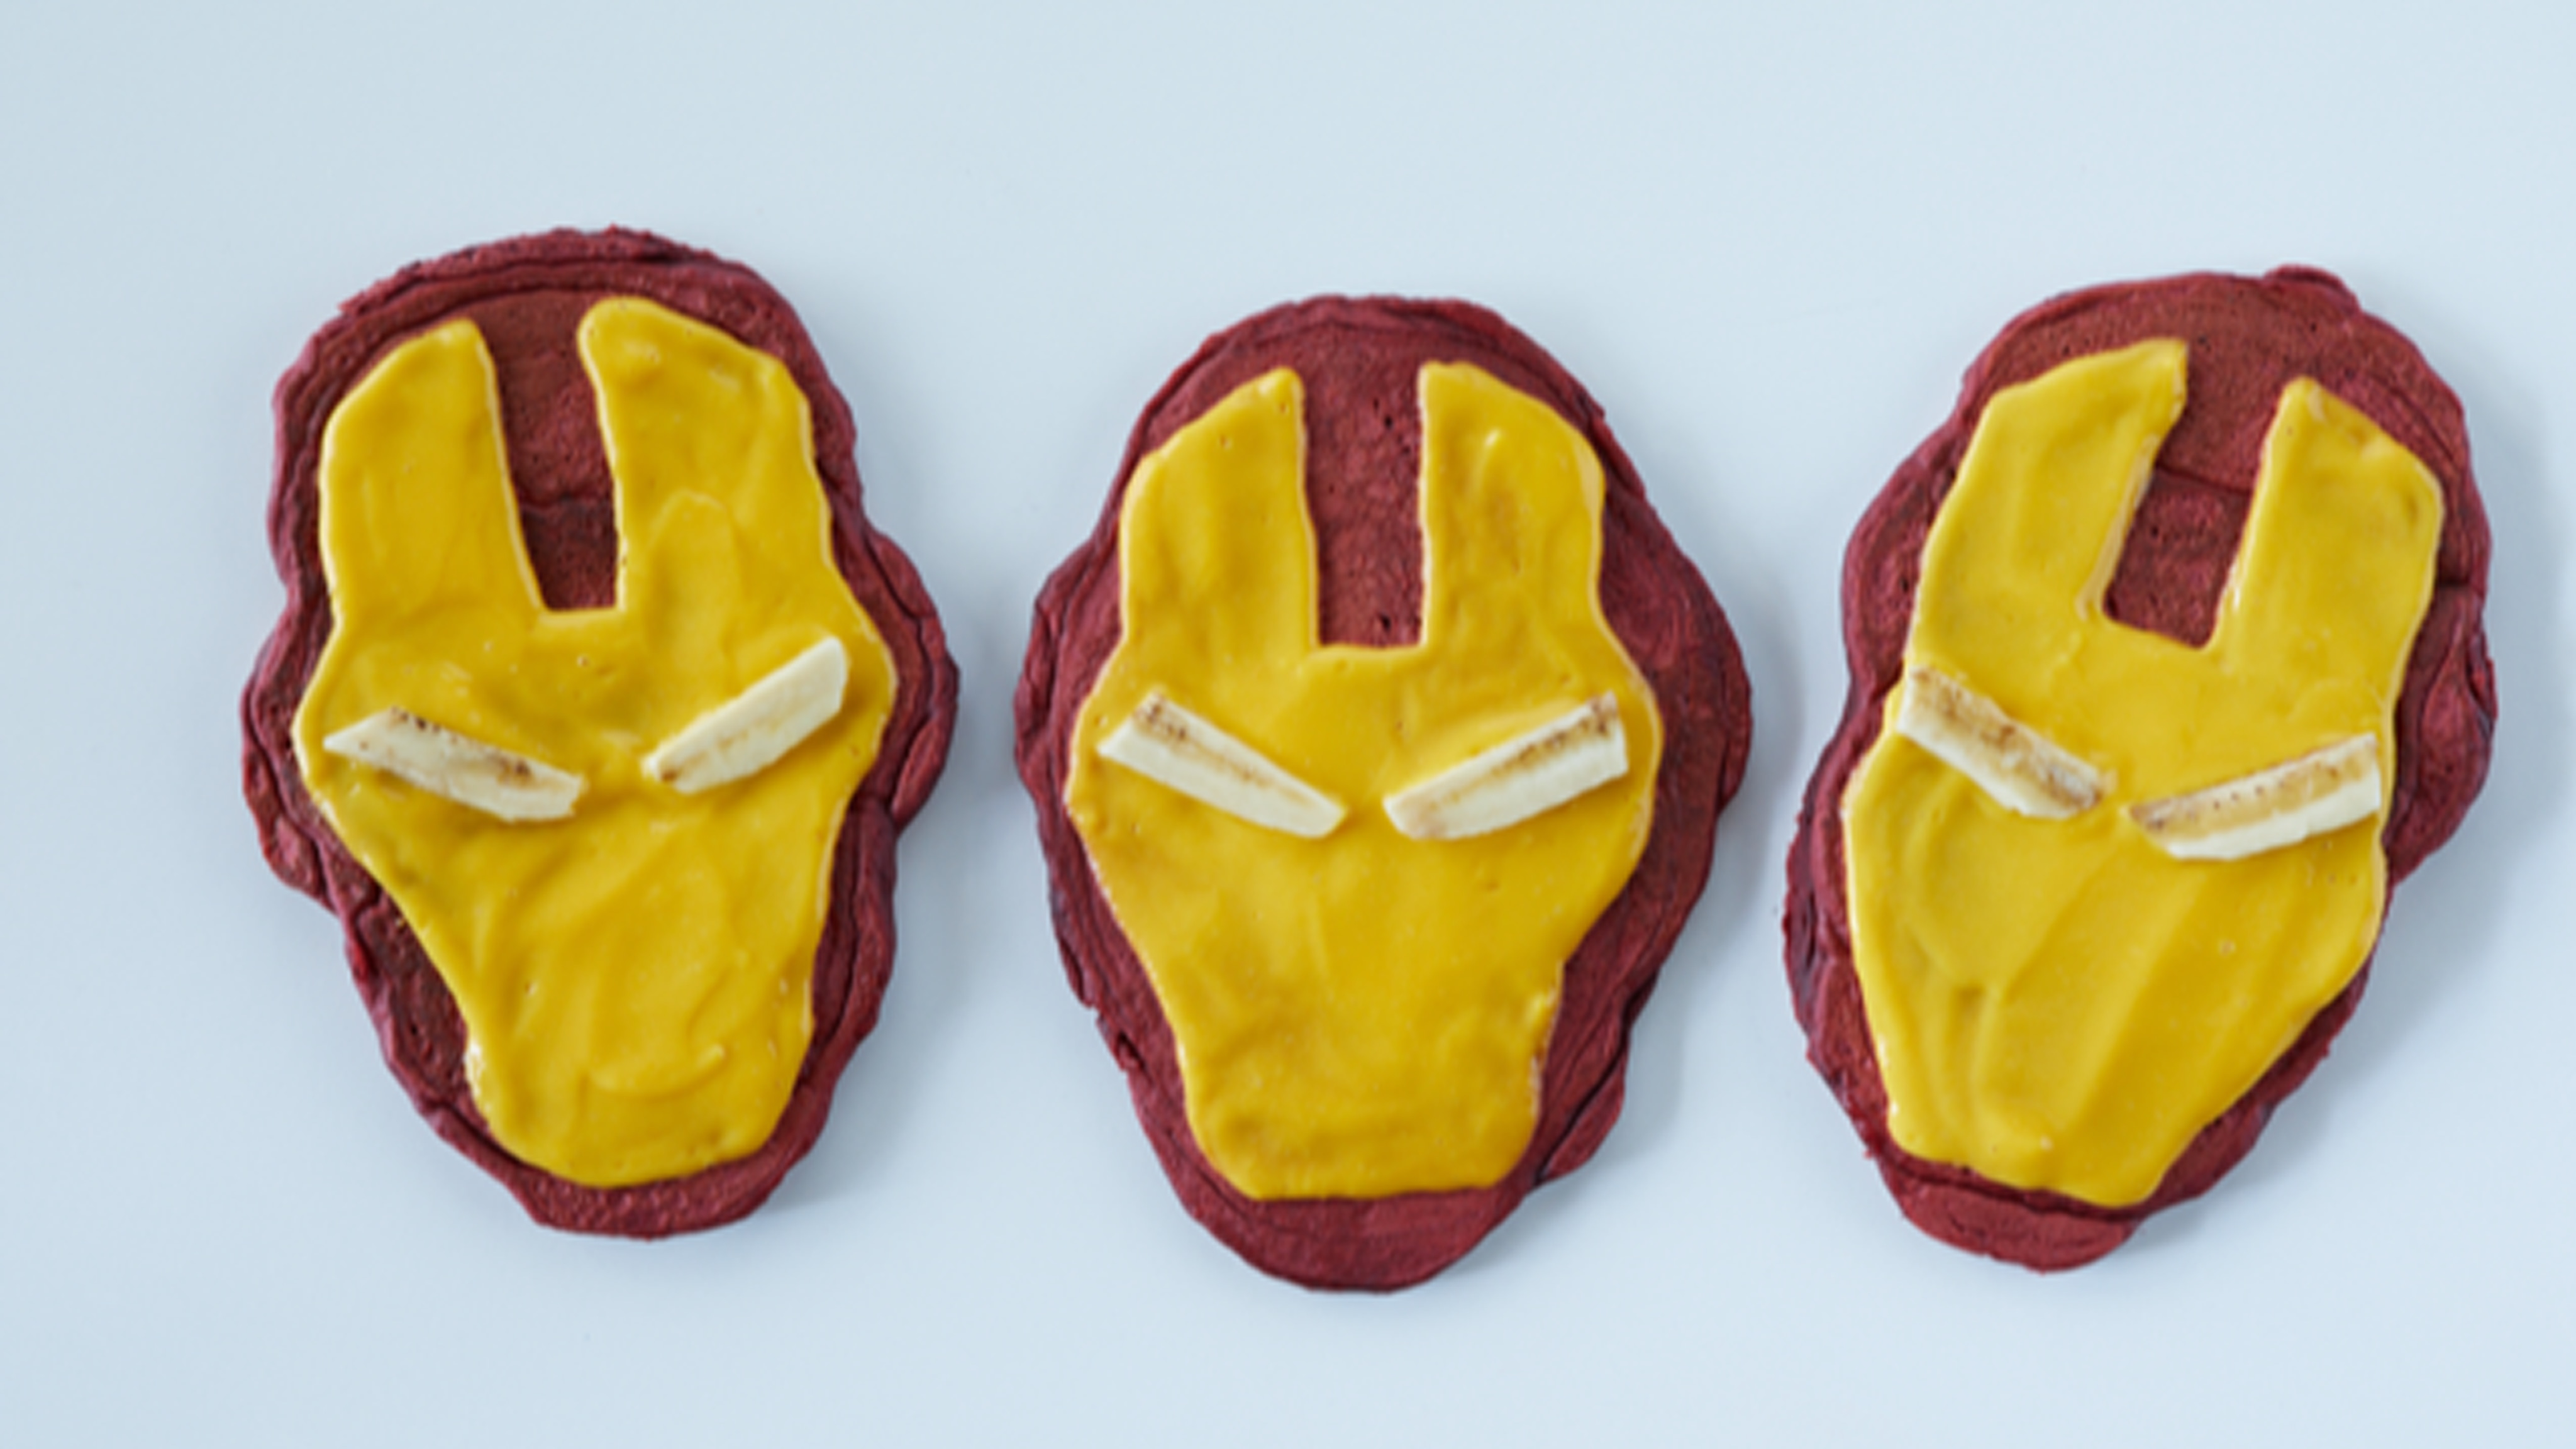 Pancake Armadura roja, inspirados en Iron Man de Marvel